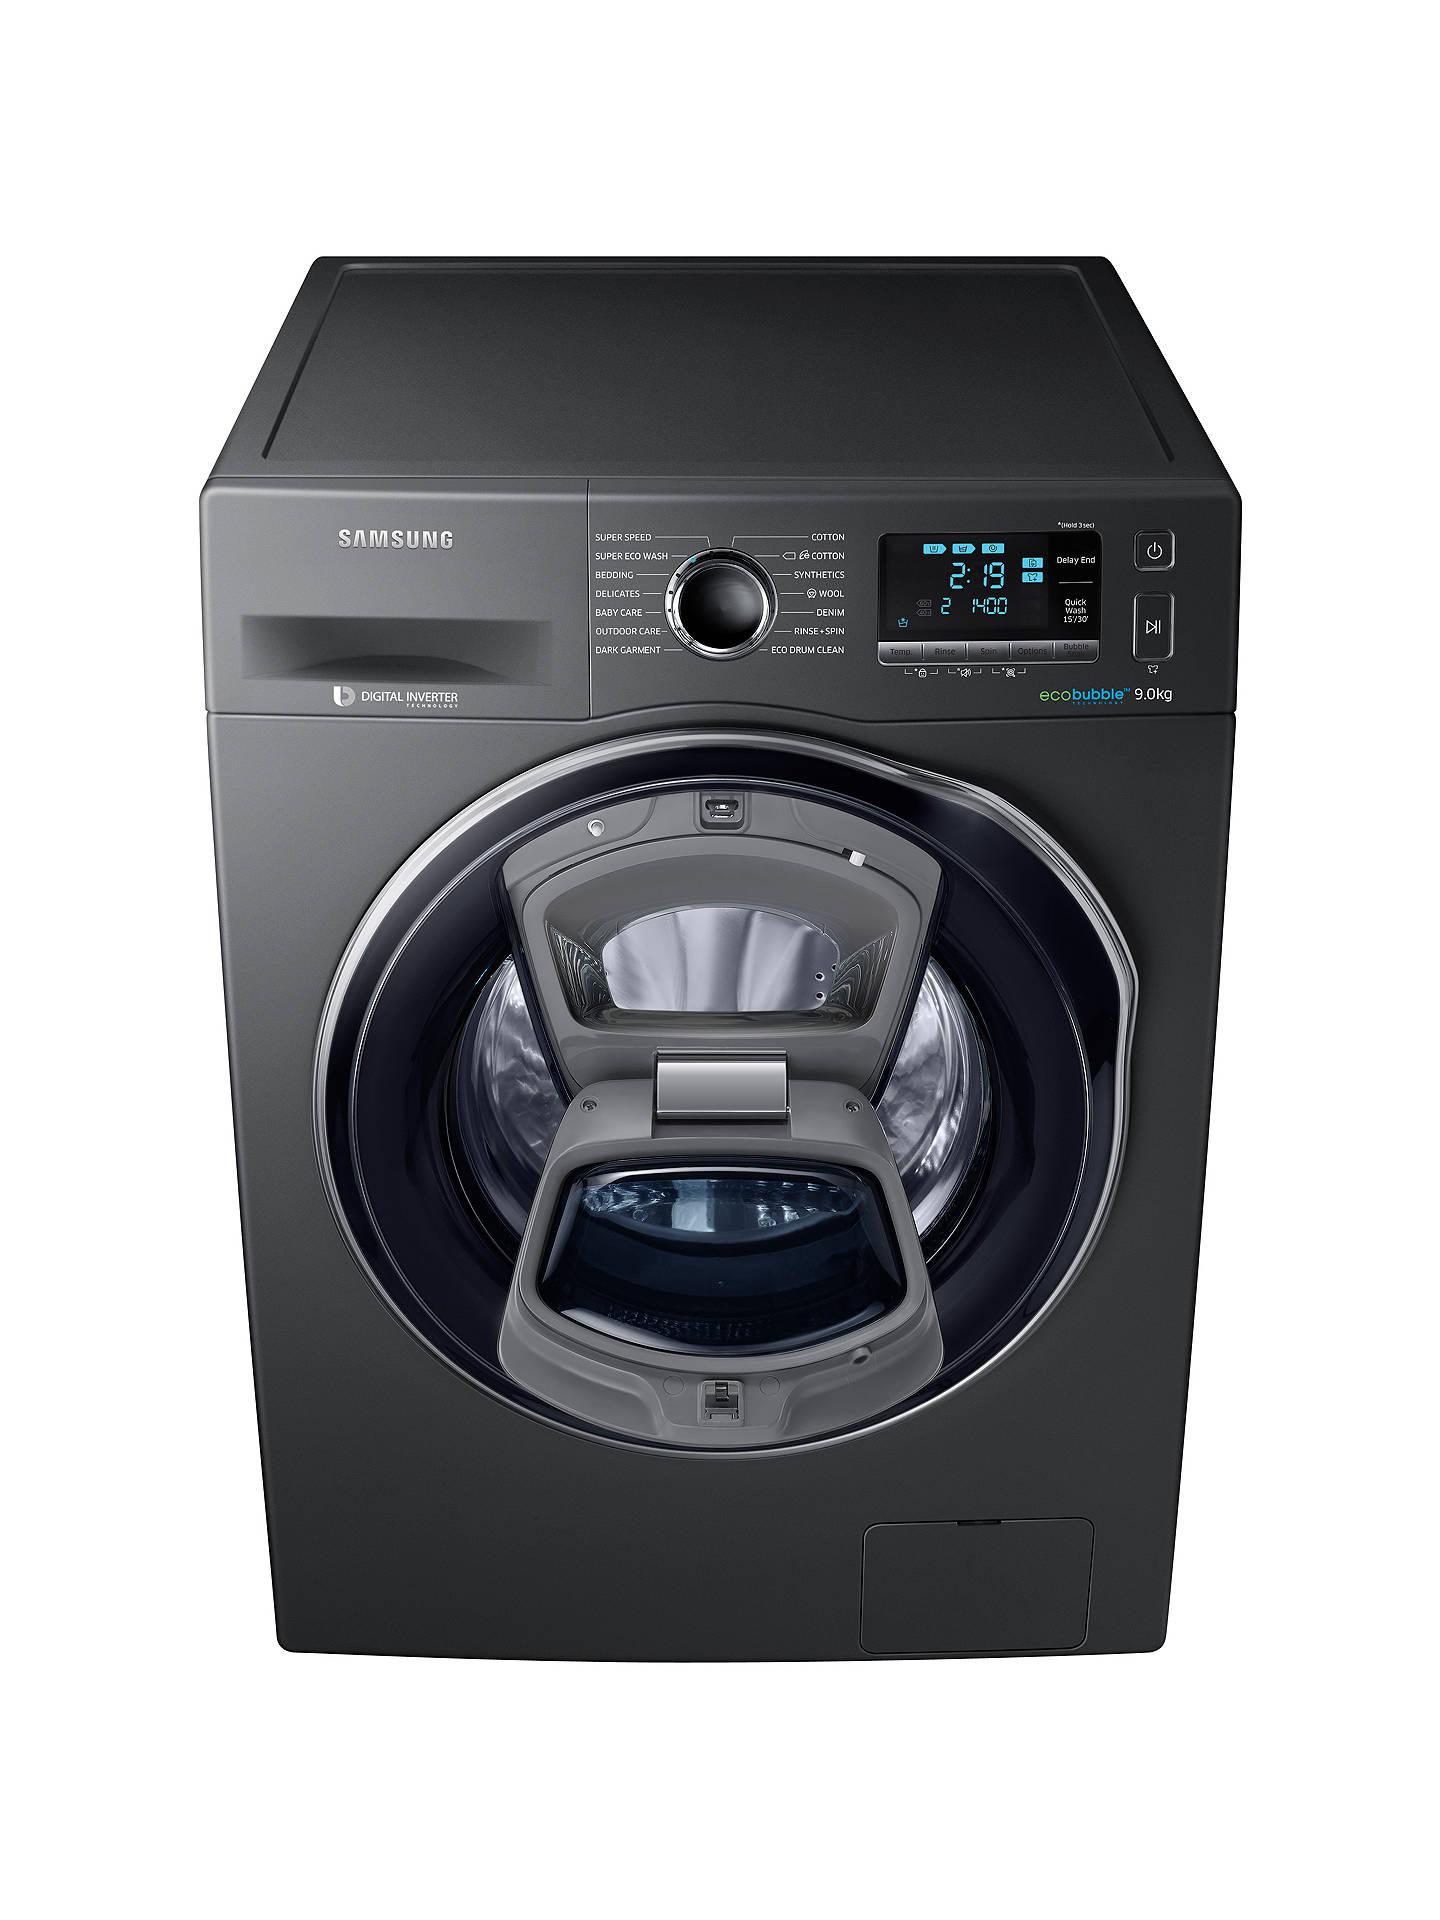 Samsung AddWash WW90K6410QX/EU Washing Machine, 9kg Load, A+++ Energy  Rating, 1400rpm Spin, Inox